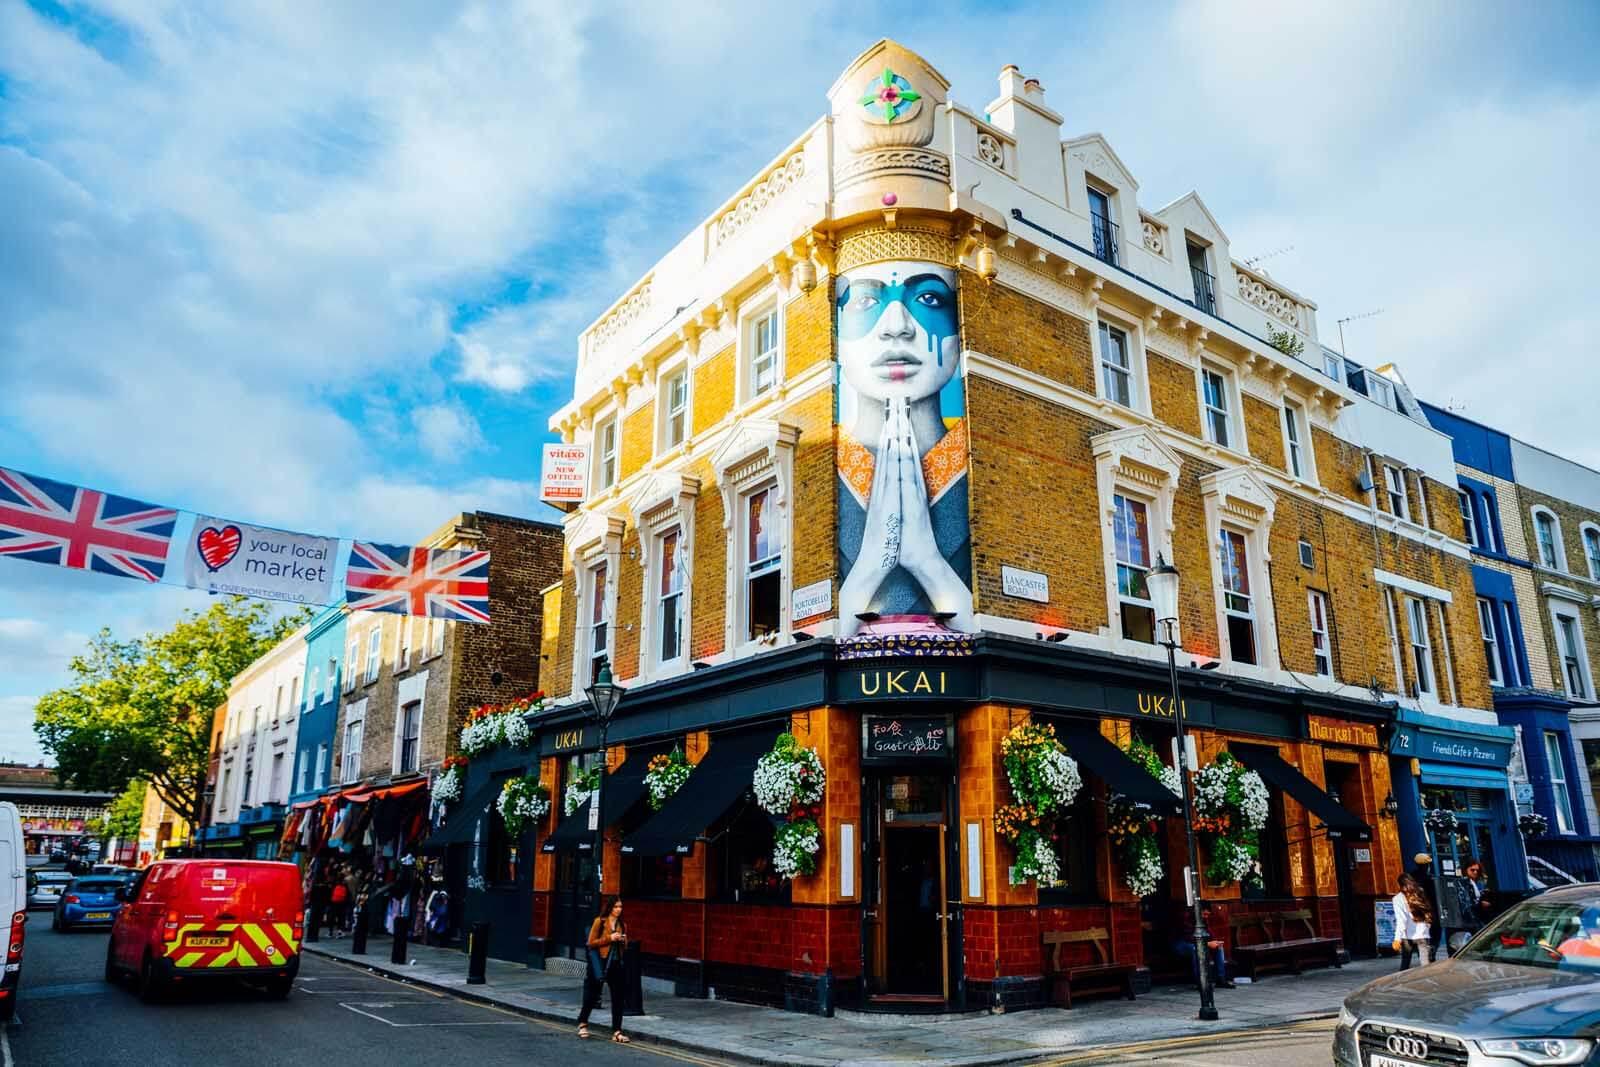 Ukai restaurant on Portobello Road in London